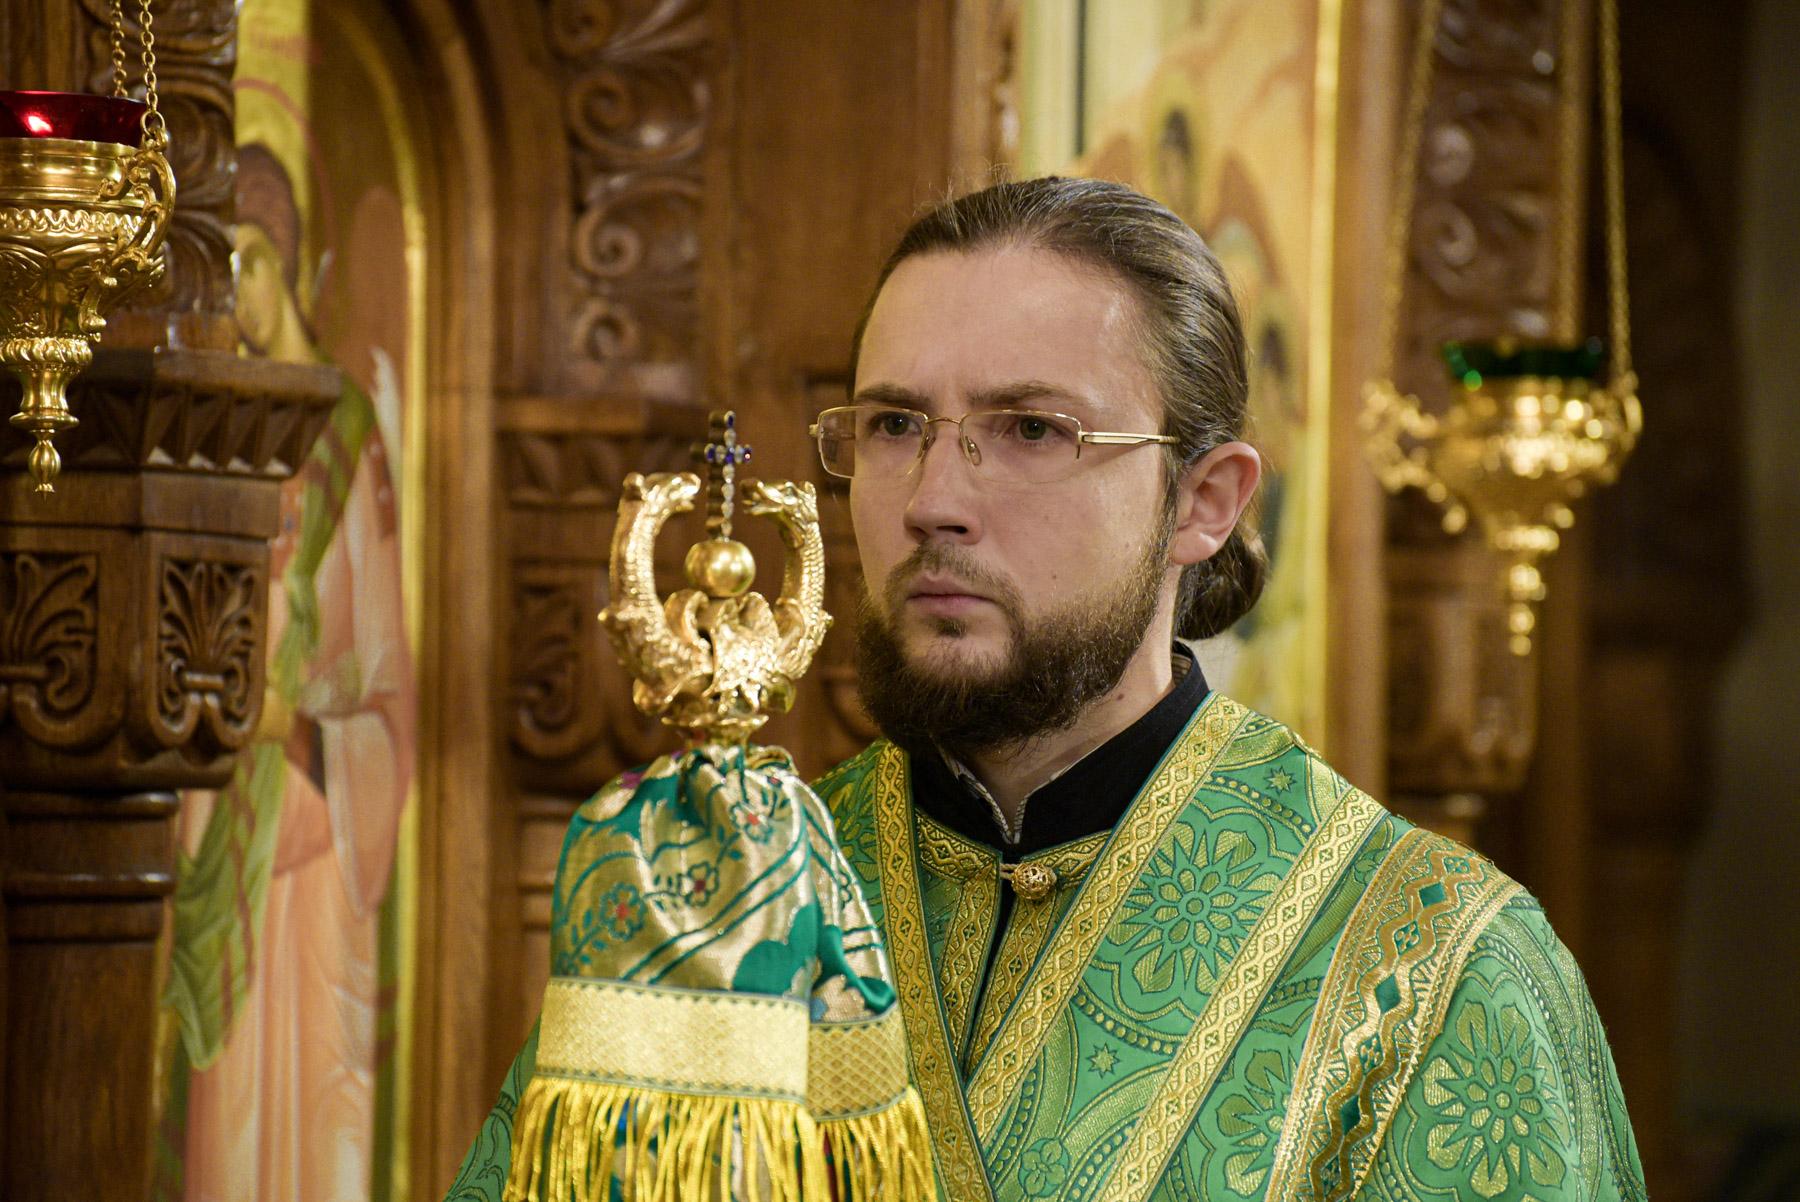 photos of orthodox christmas 0067 2